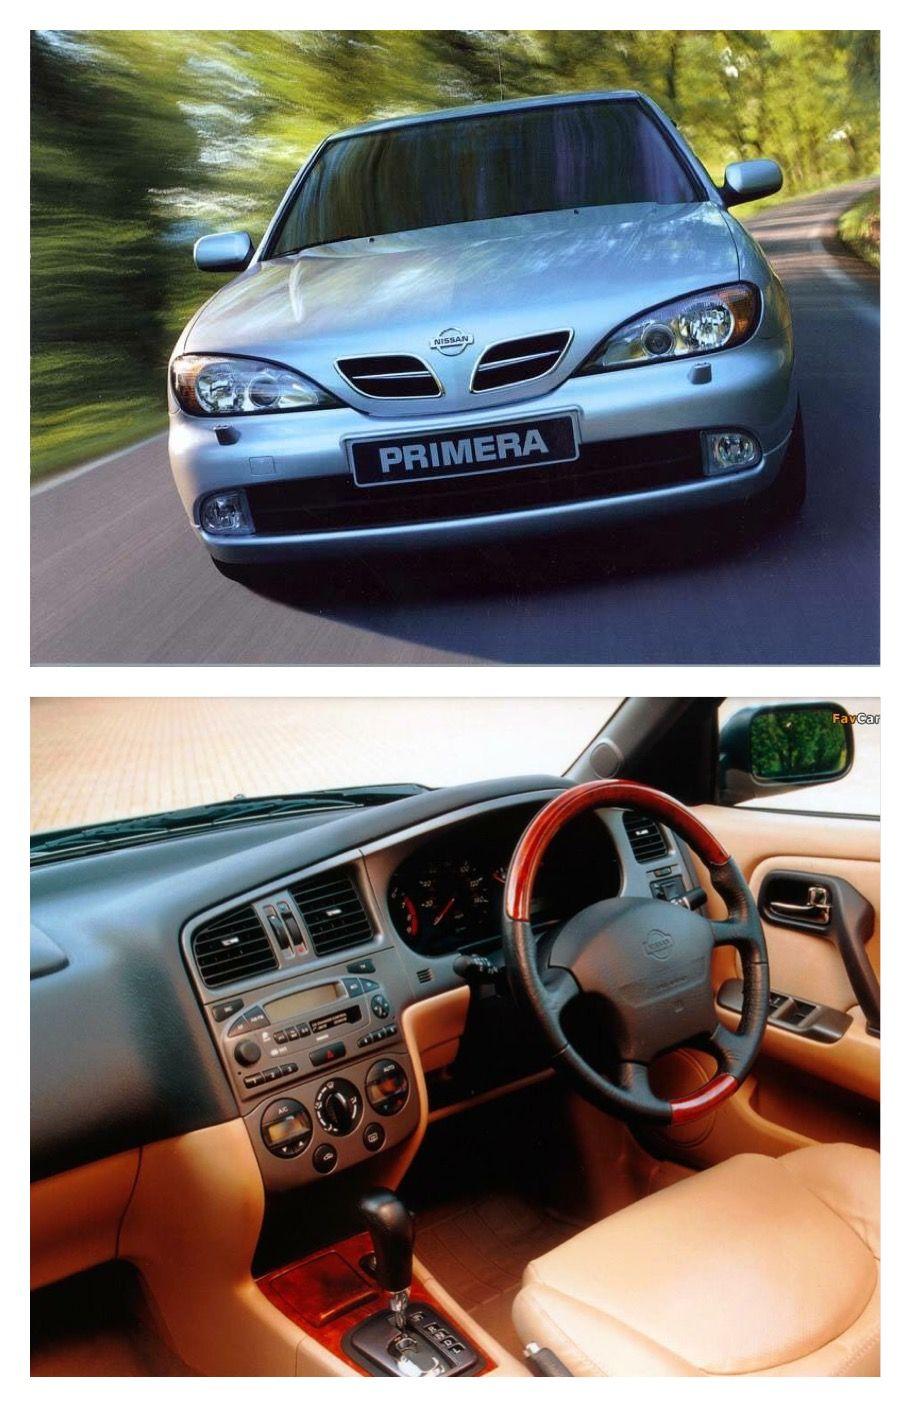 Nissan primera facelift nissan datsun pinterest nissan and nissan primera facelift vanachro Gallery